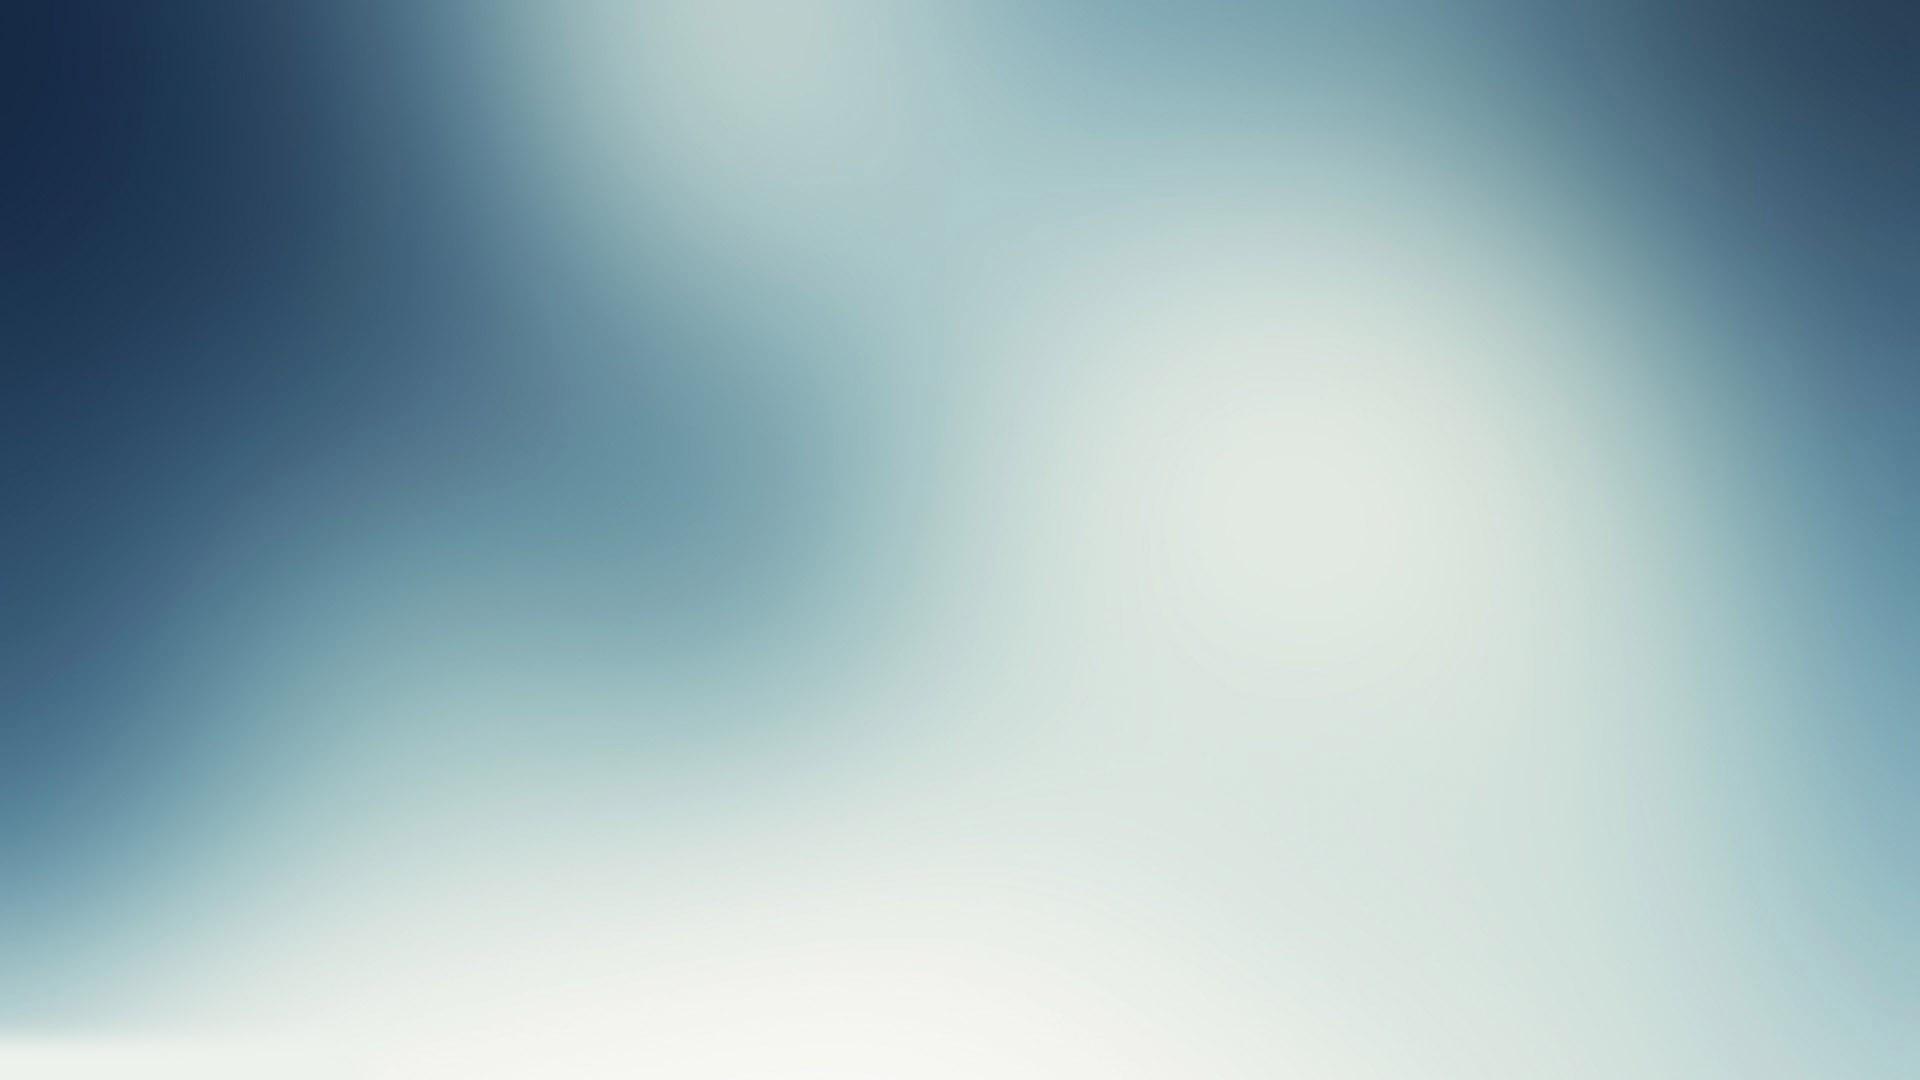 Free-Silver-Backgrounds-For-Desktop-1